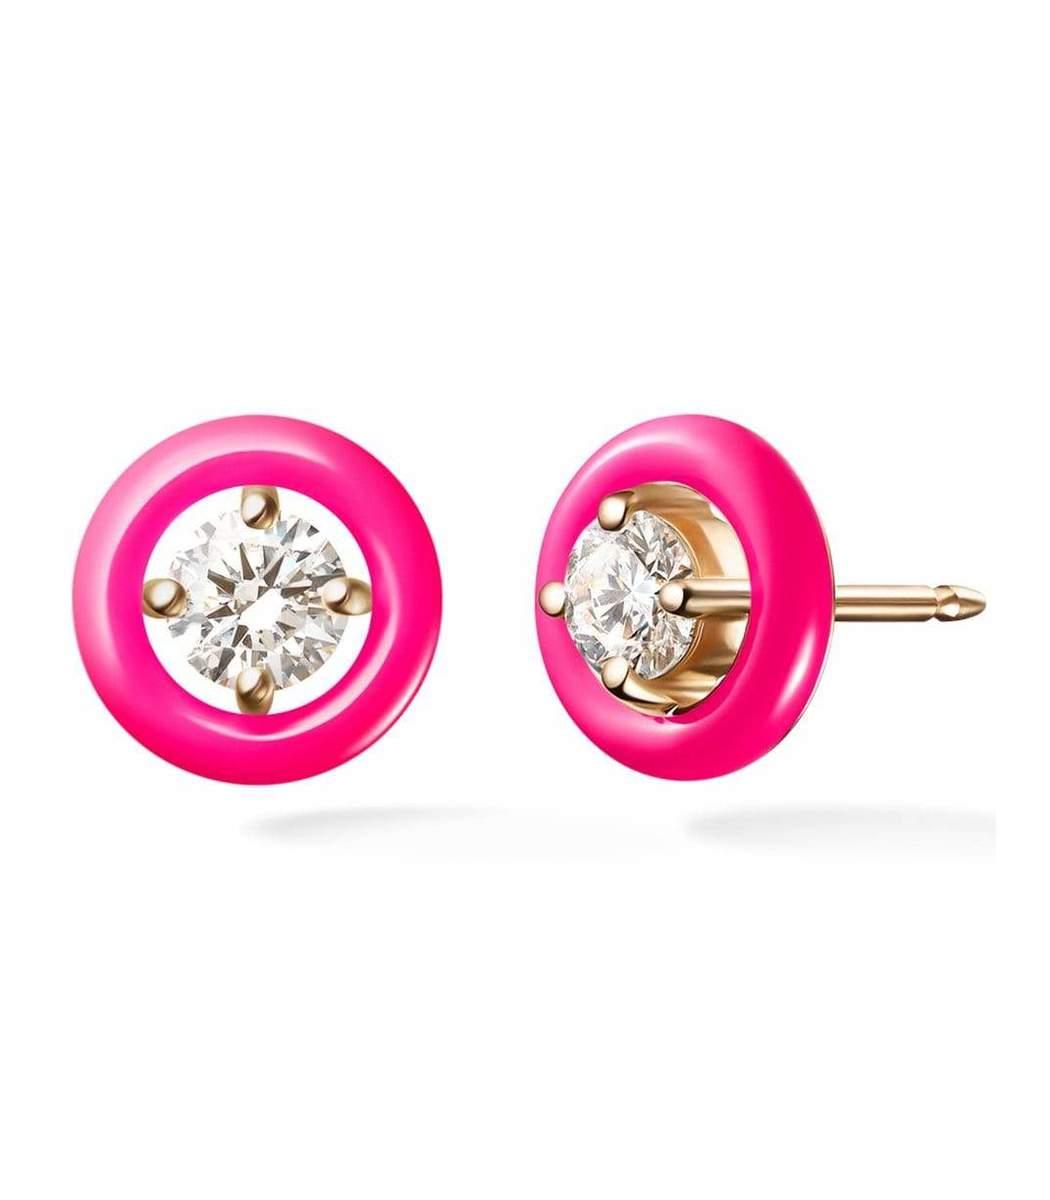 Melissa Kaye Accessories Neon Pink Enamel Sylvie Studs